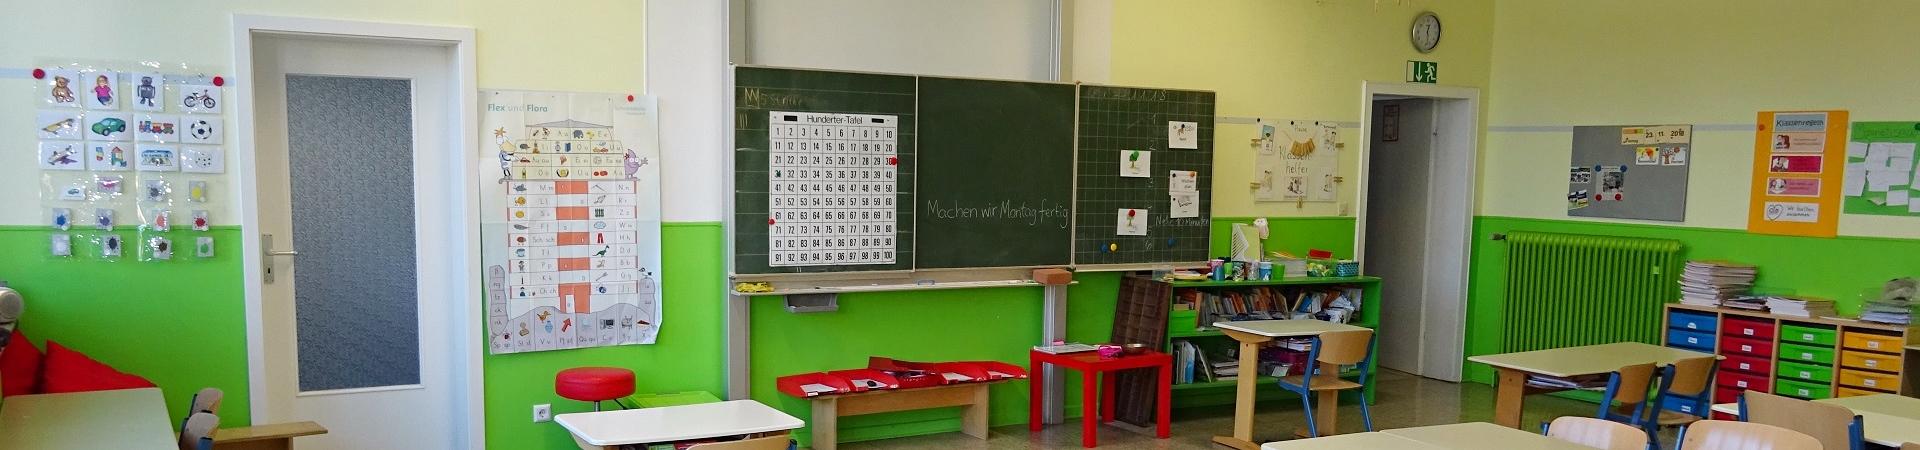 © Gemeinschaftsgrundschule Schnellenbach